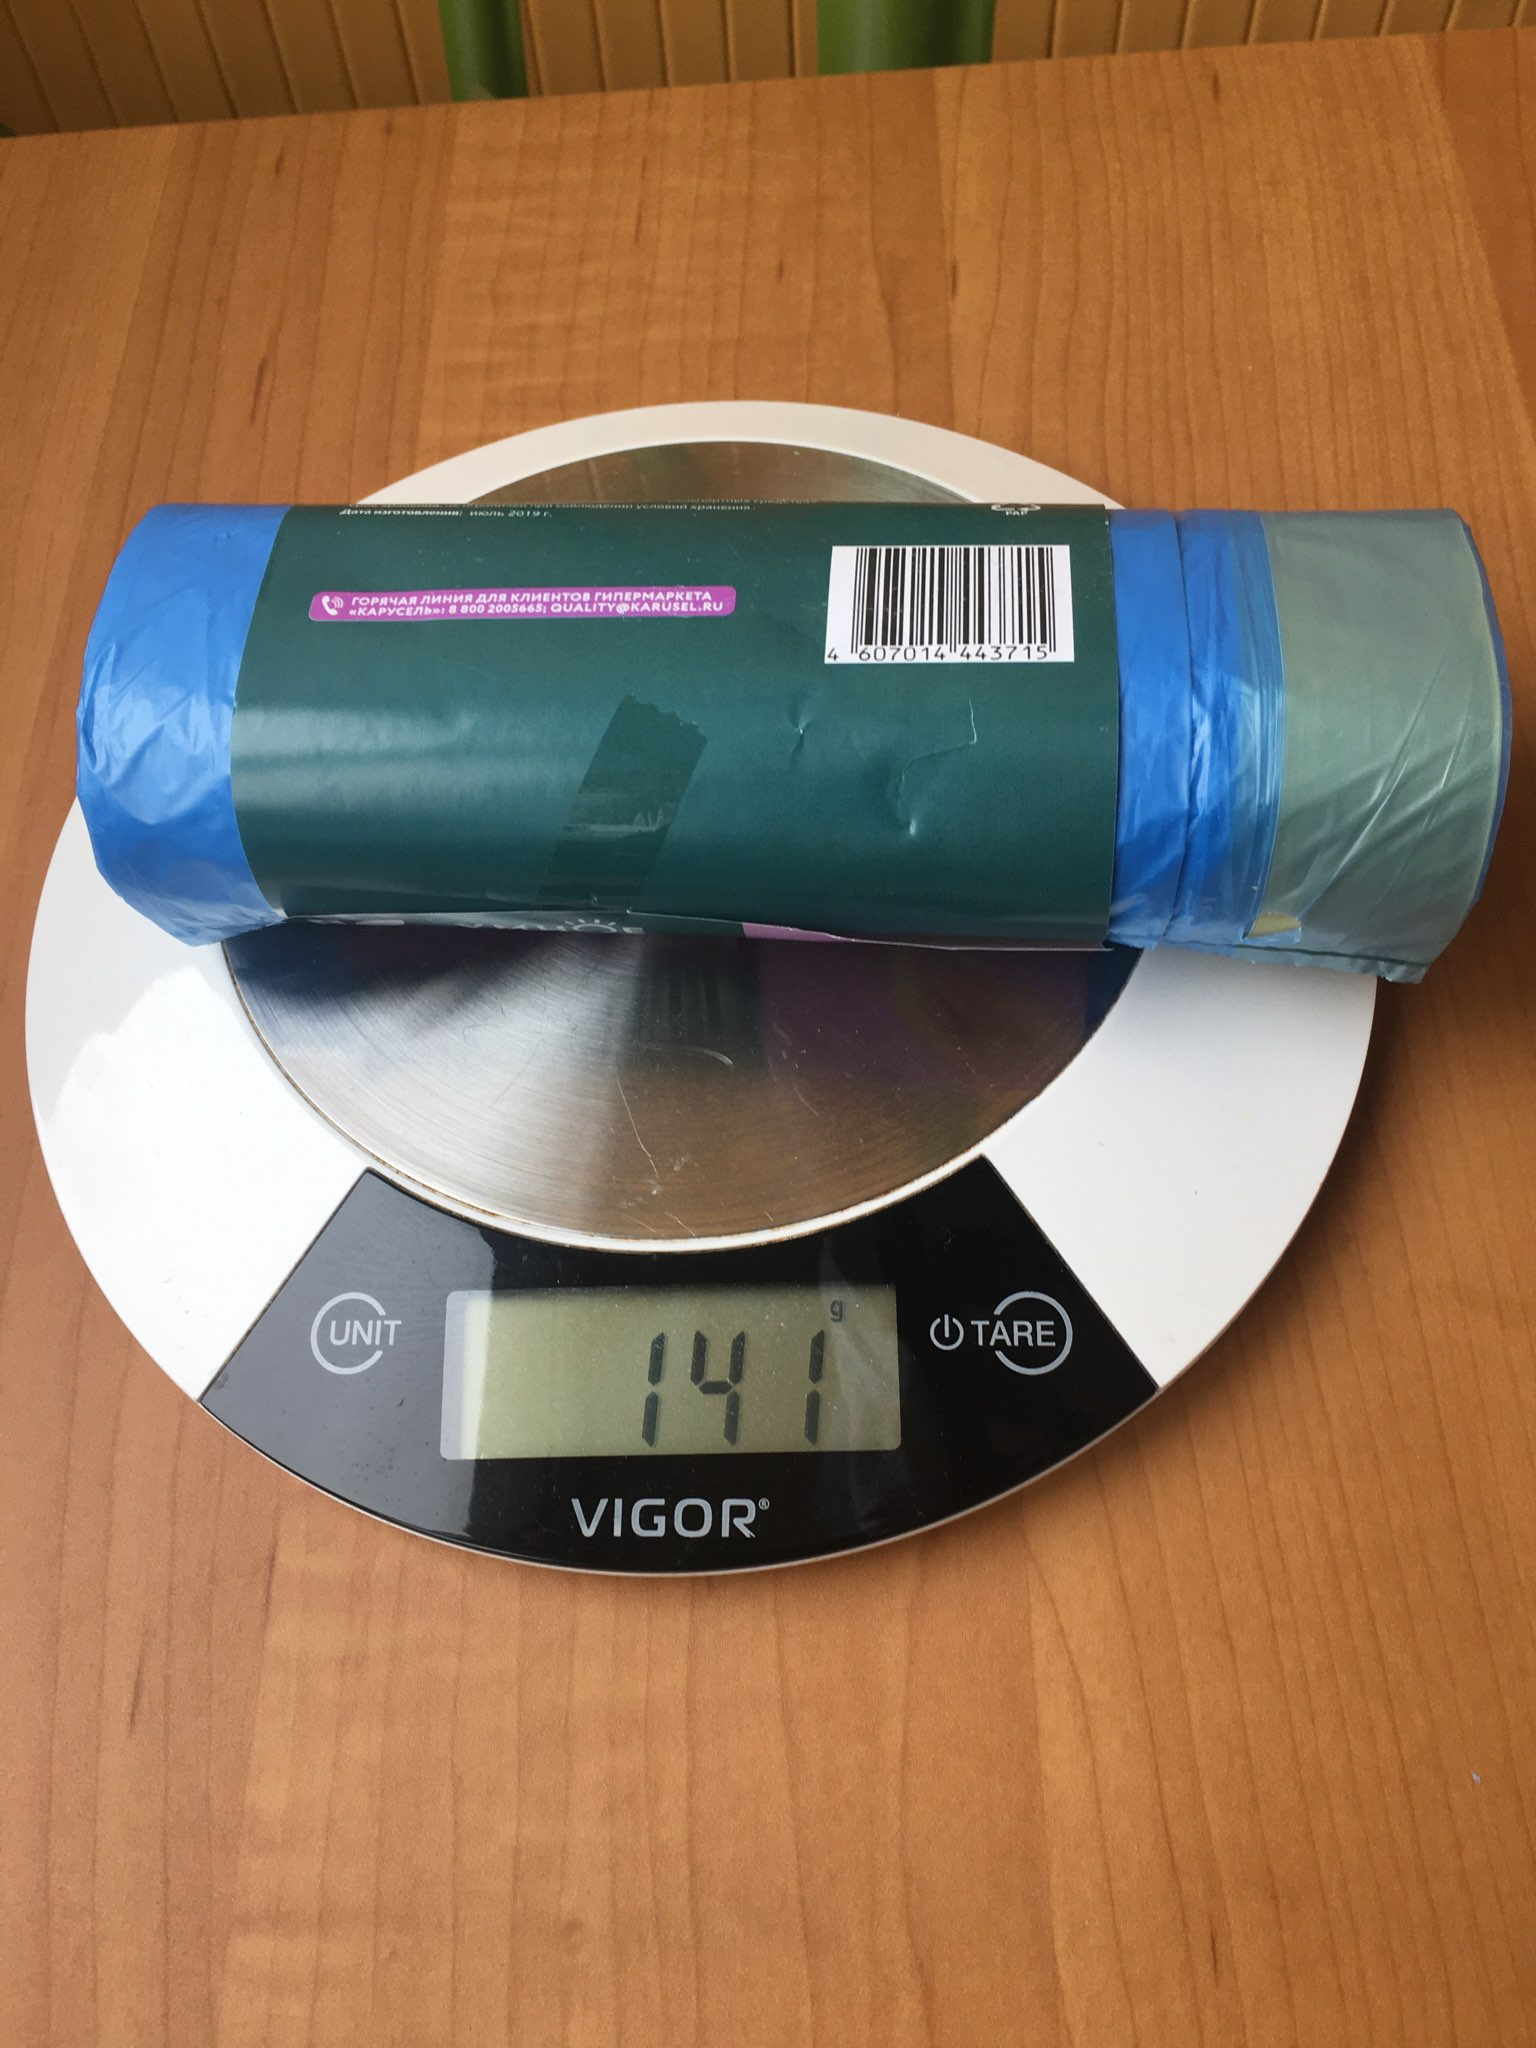 вес пакетов для мусора в рулоне